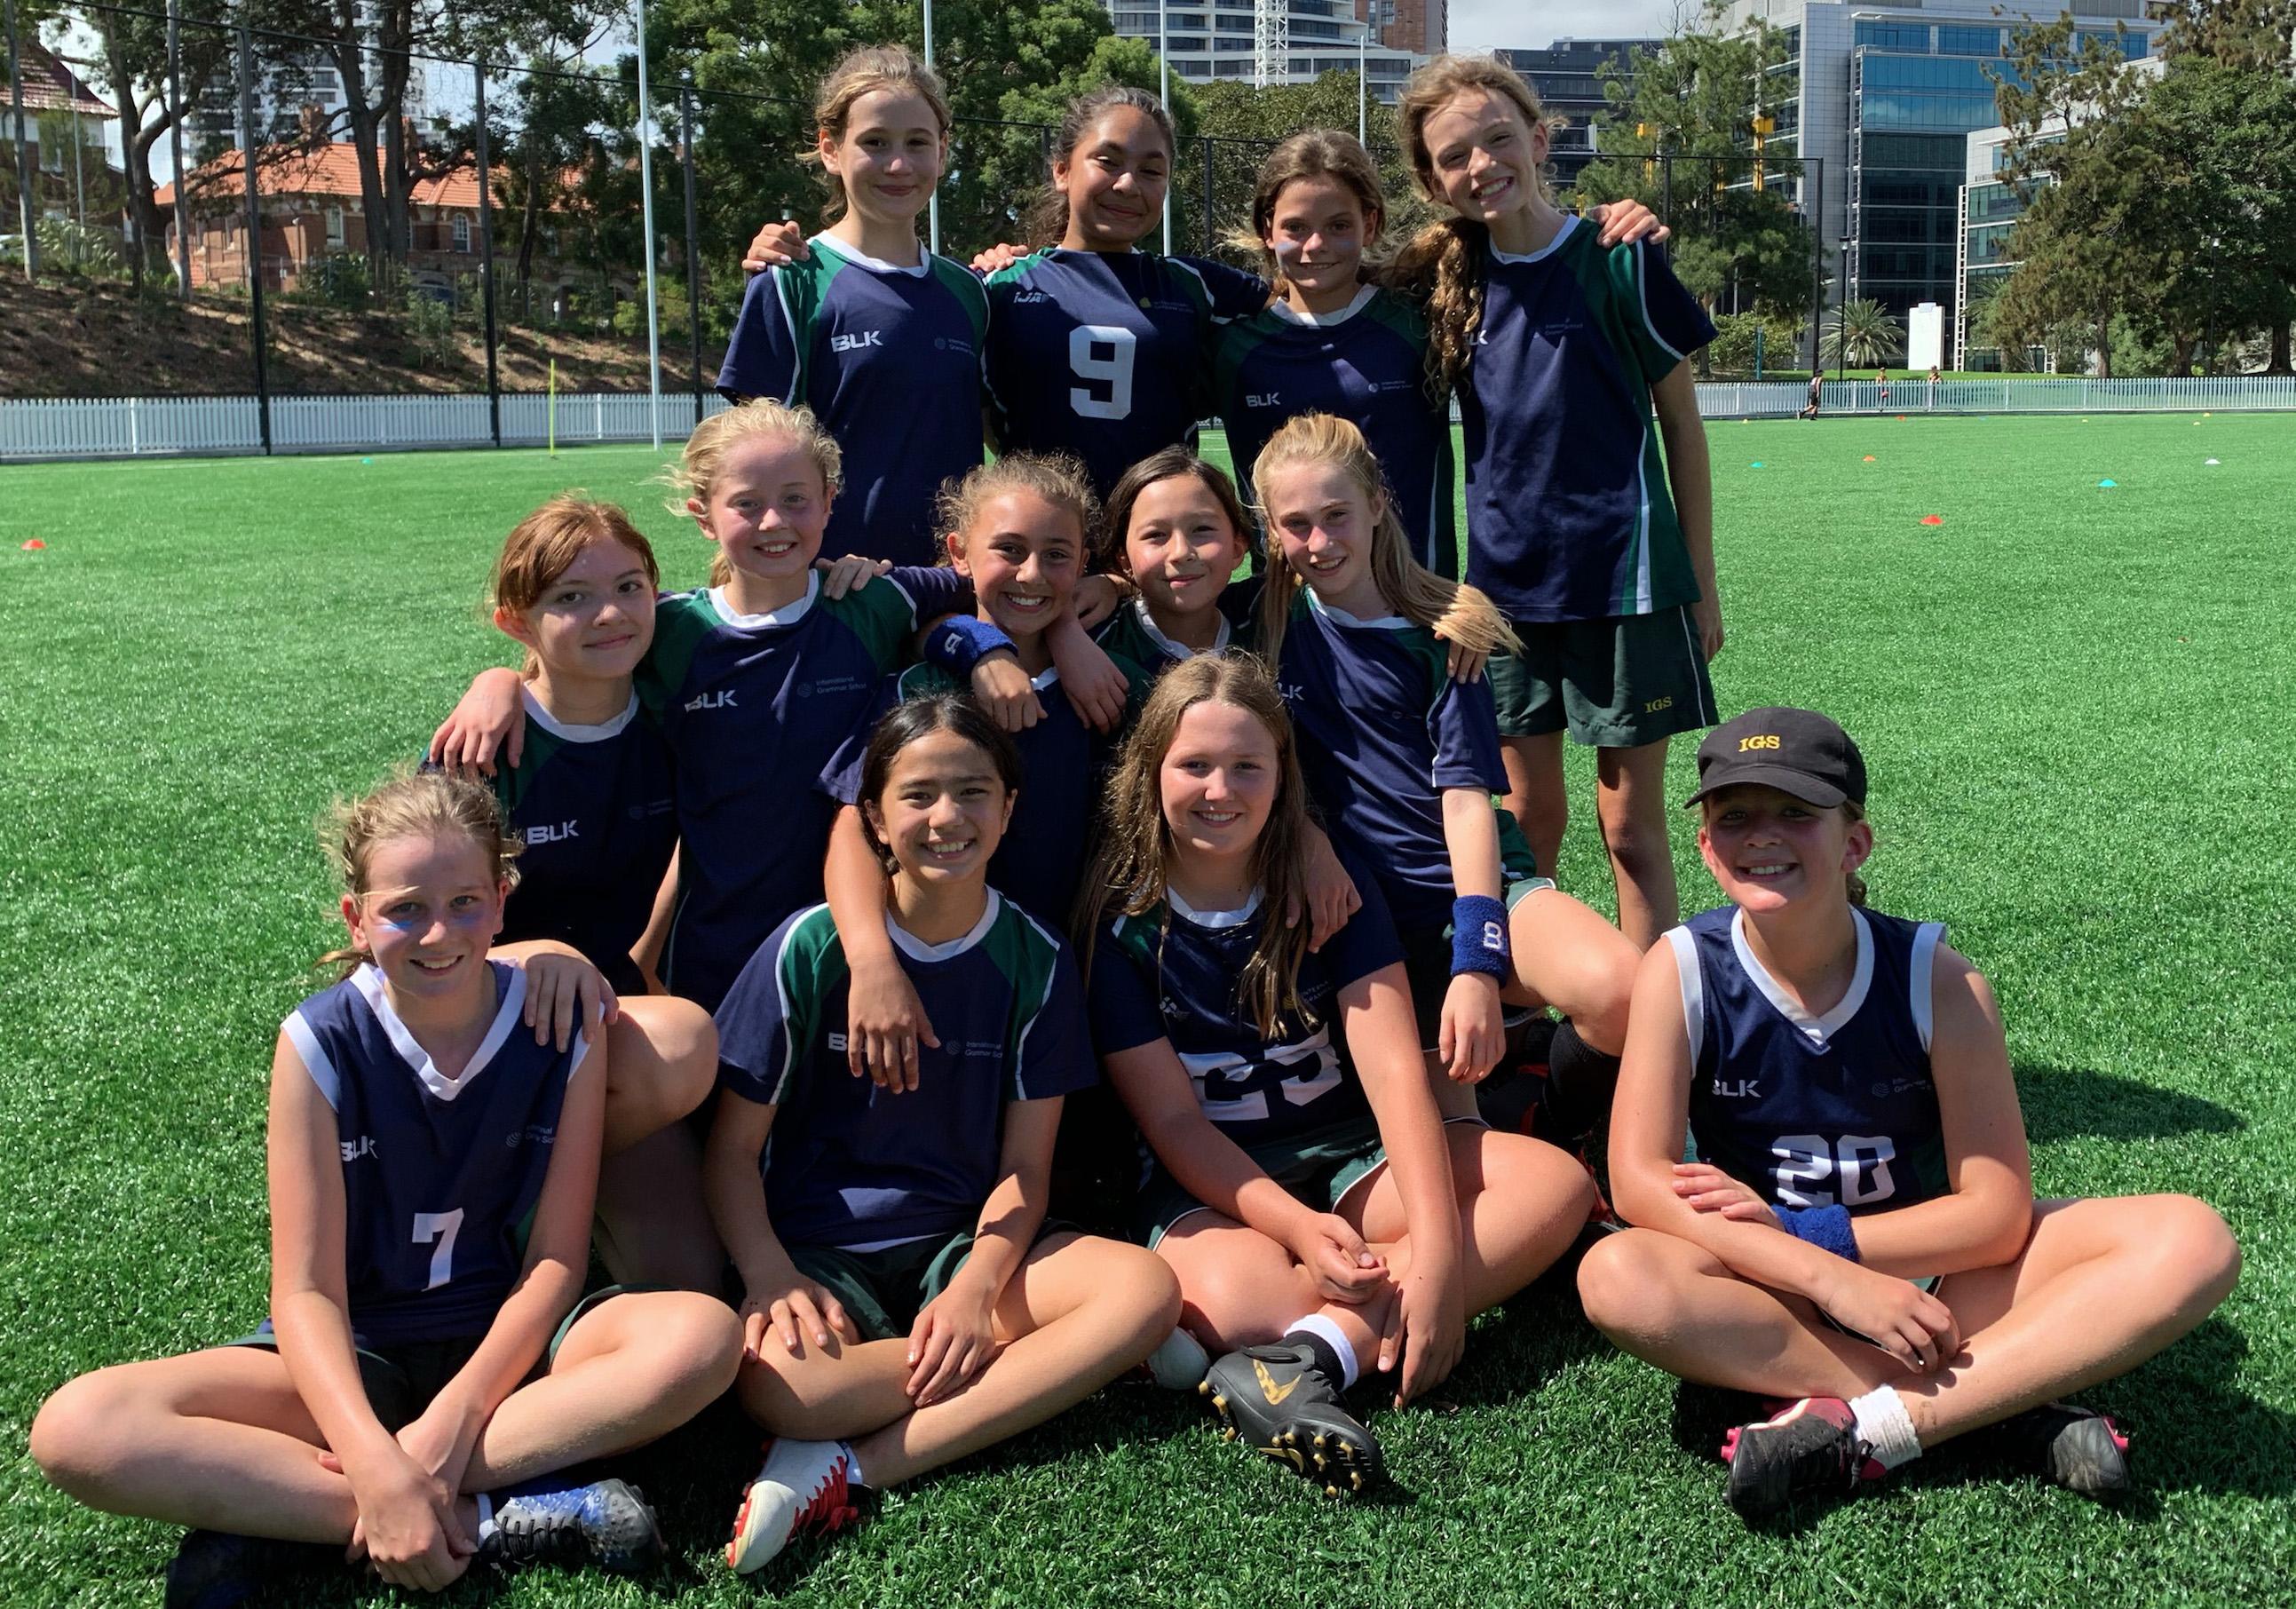 igs-afl-paul-kelly-cup-girls-team